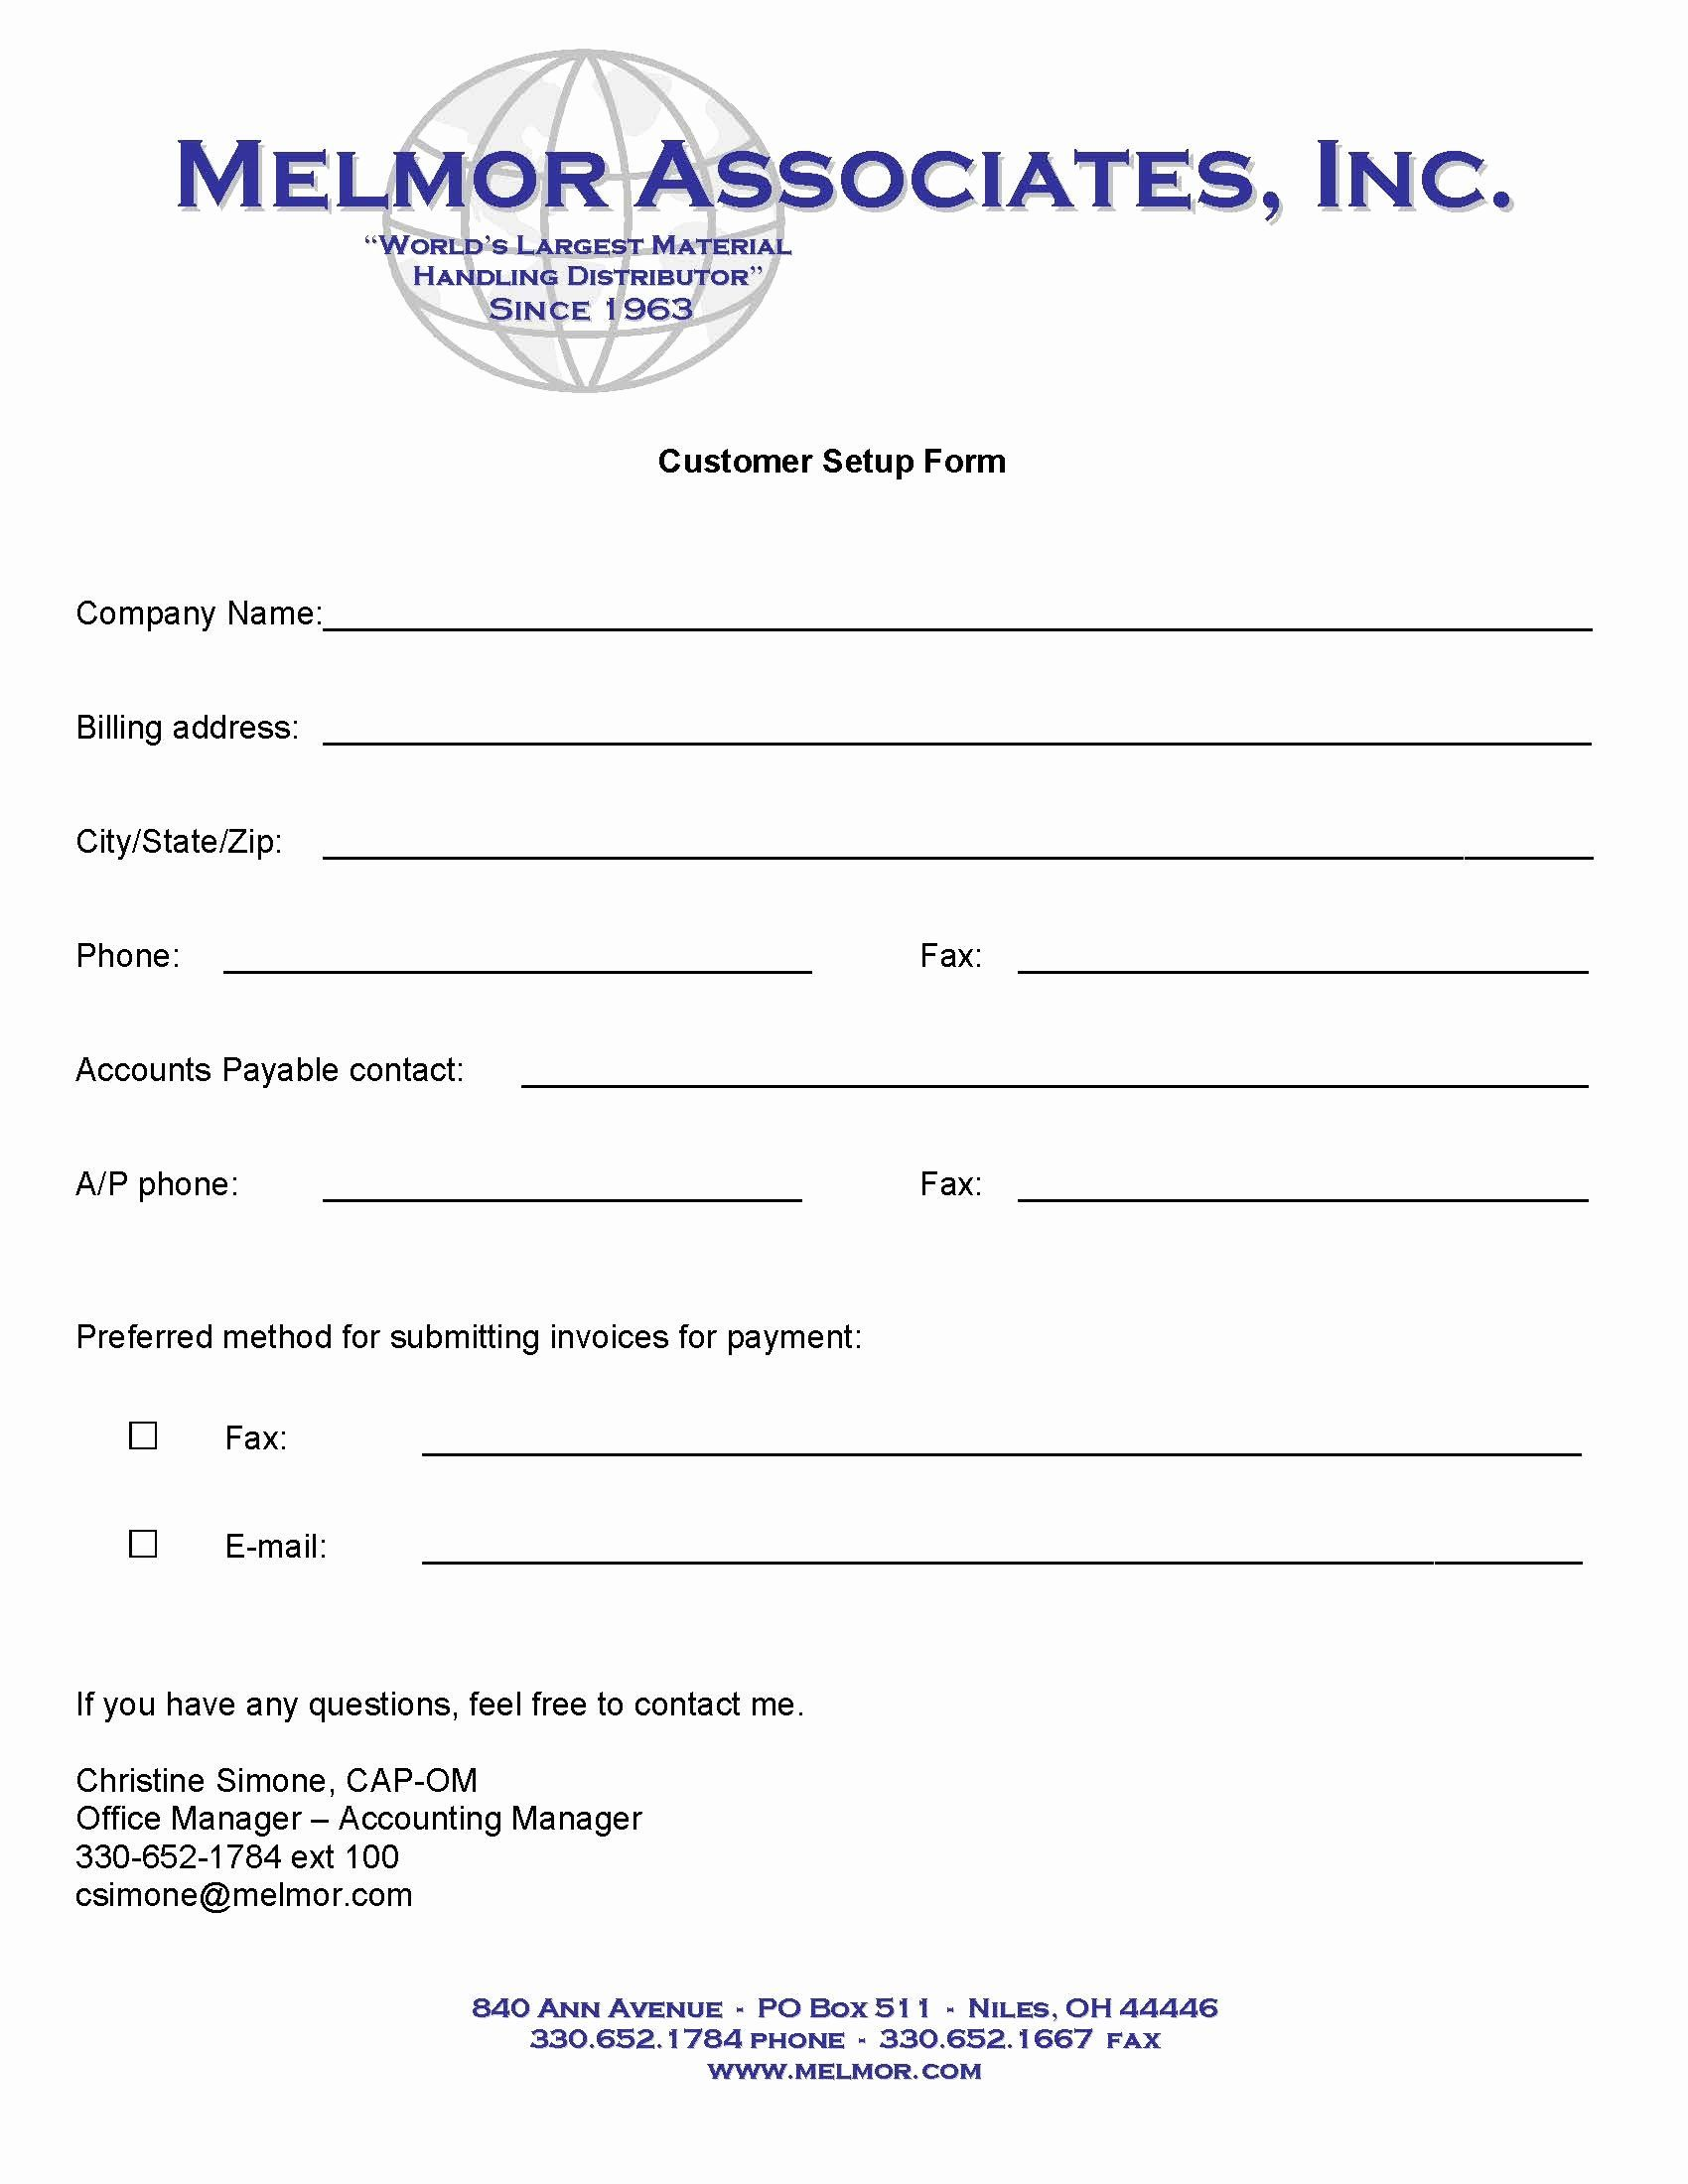 Vendor Setup Form Template Fresh New Accounts Melmor Associates Inc Templates Contract Template Create Flyers